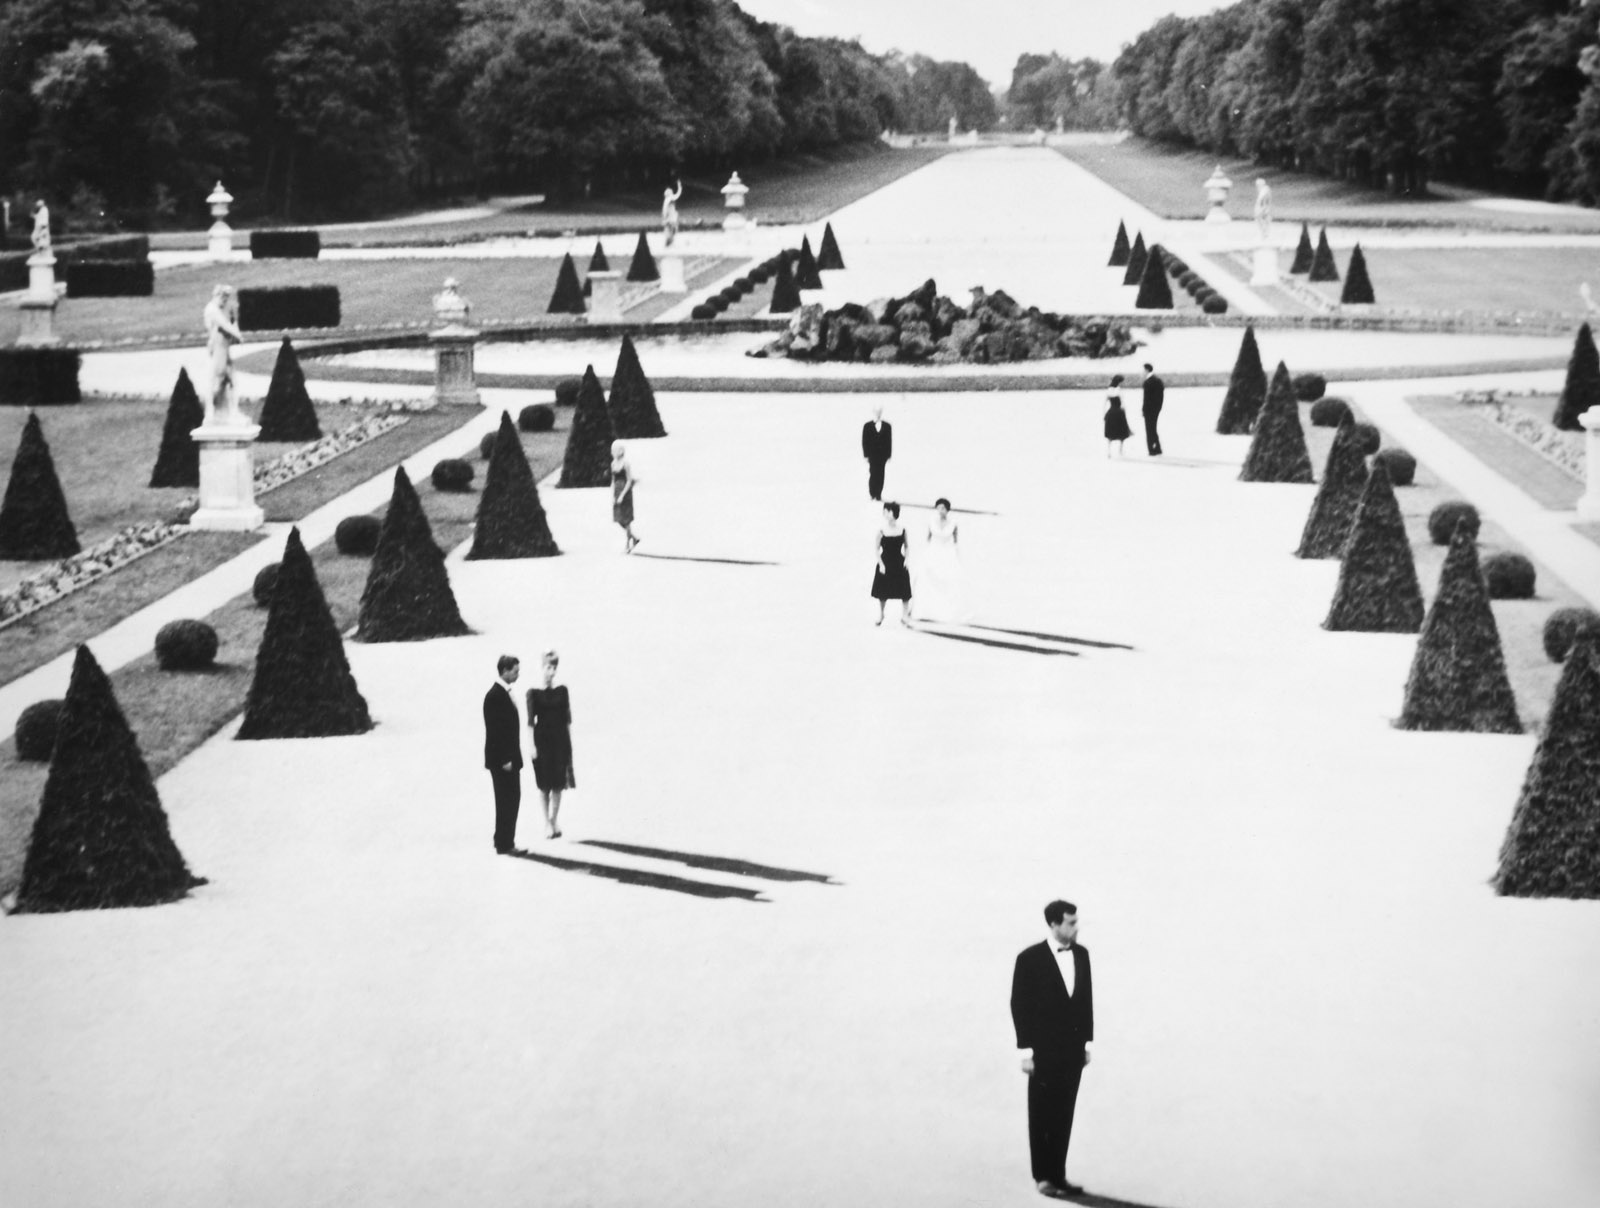 A still from Alain Resnais's film Last Year at Marienbad, 1961